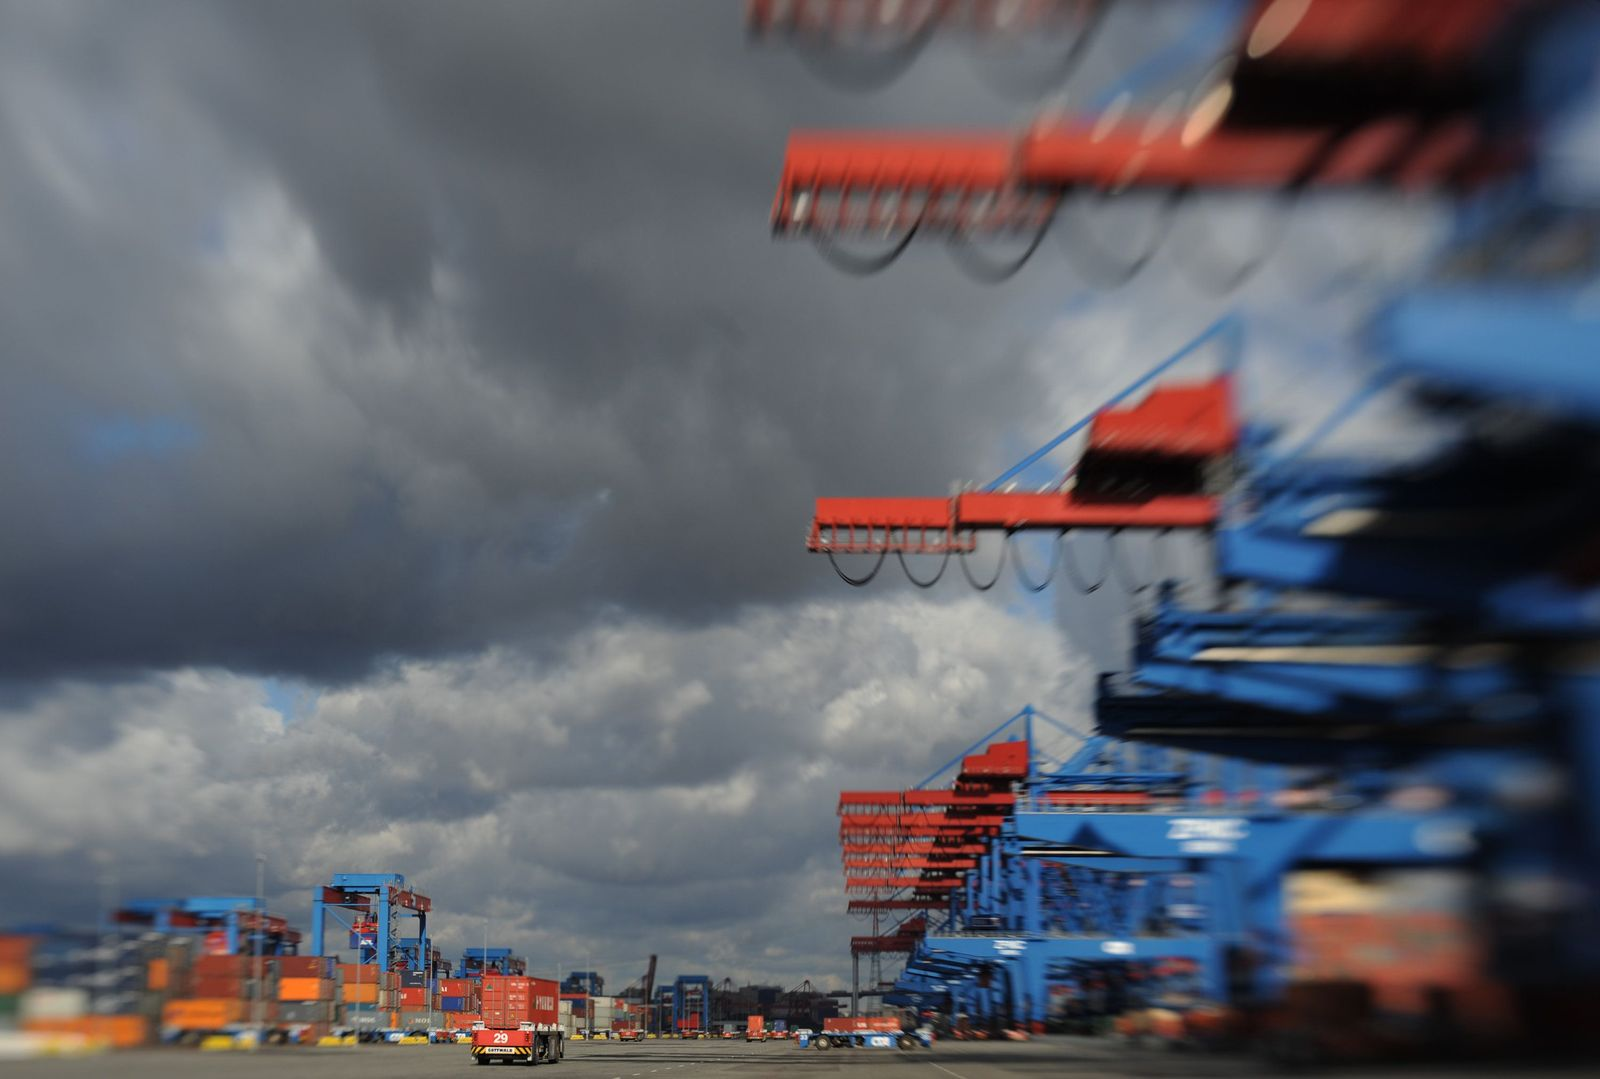 Konjunktur / Hamburger Hafen